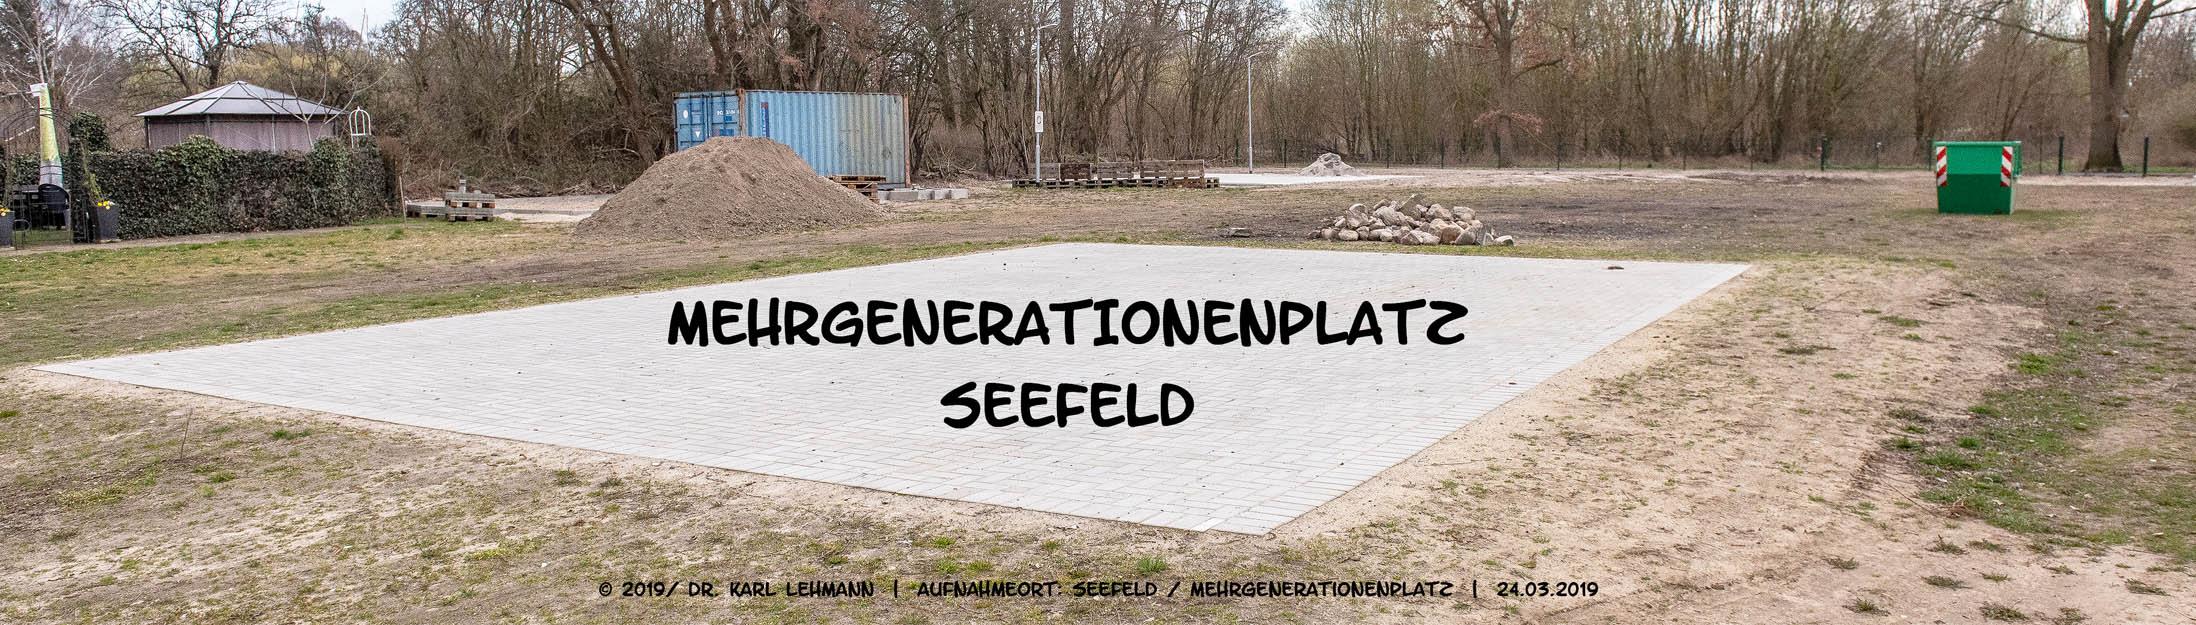 Mehrgenerationenplatz Seefeld Header 03_2019